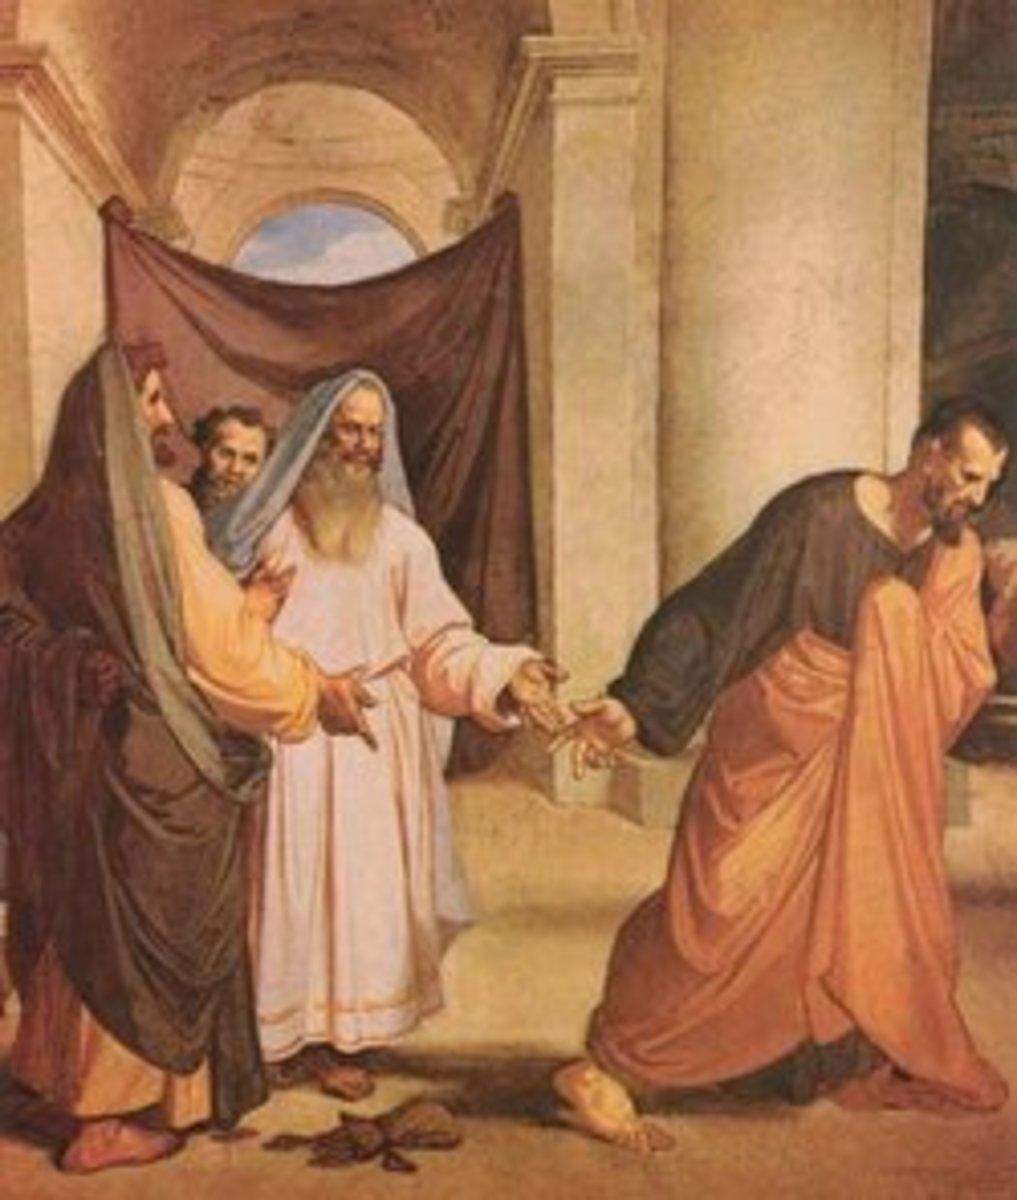 Judas the Misunderstood Disciple